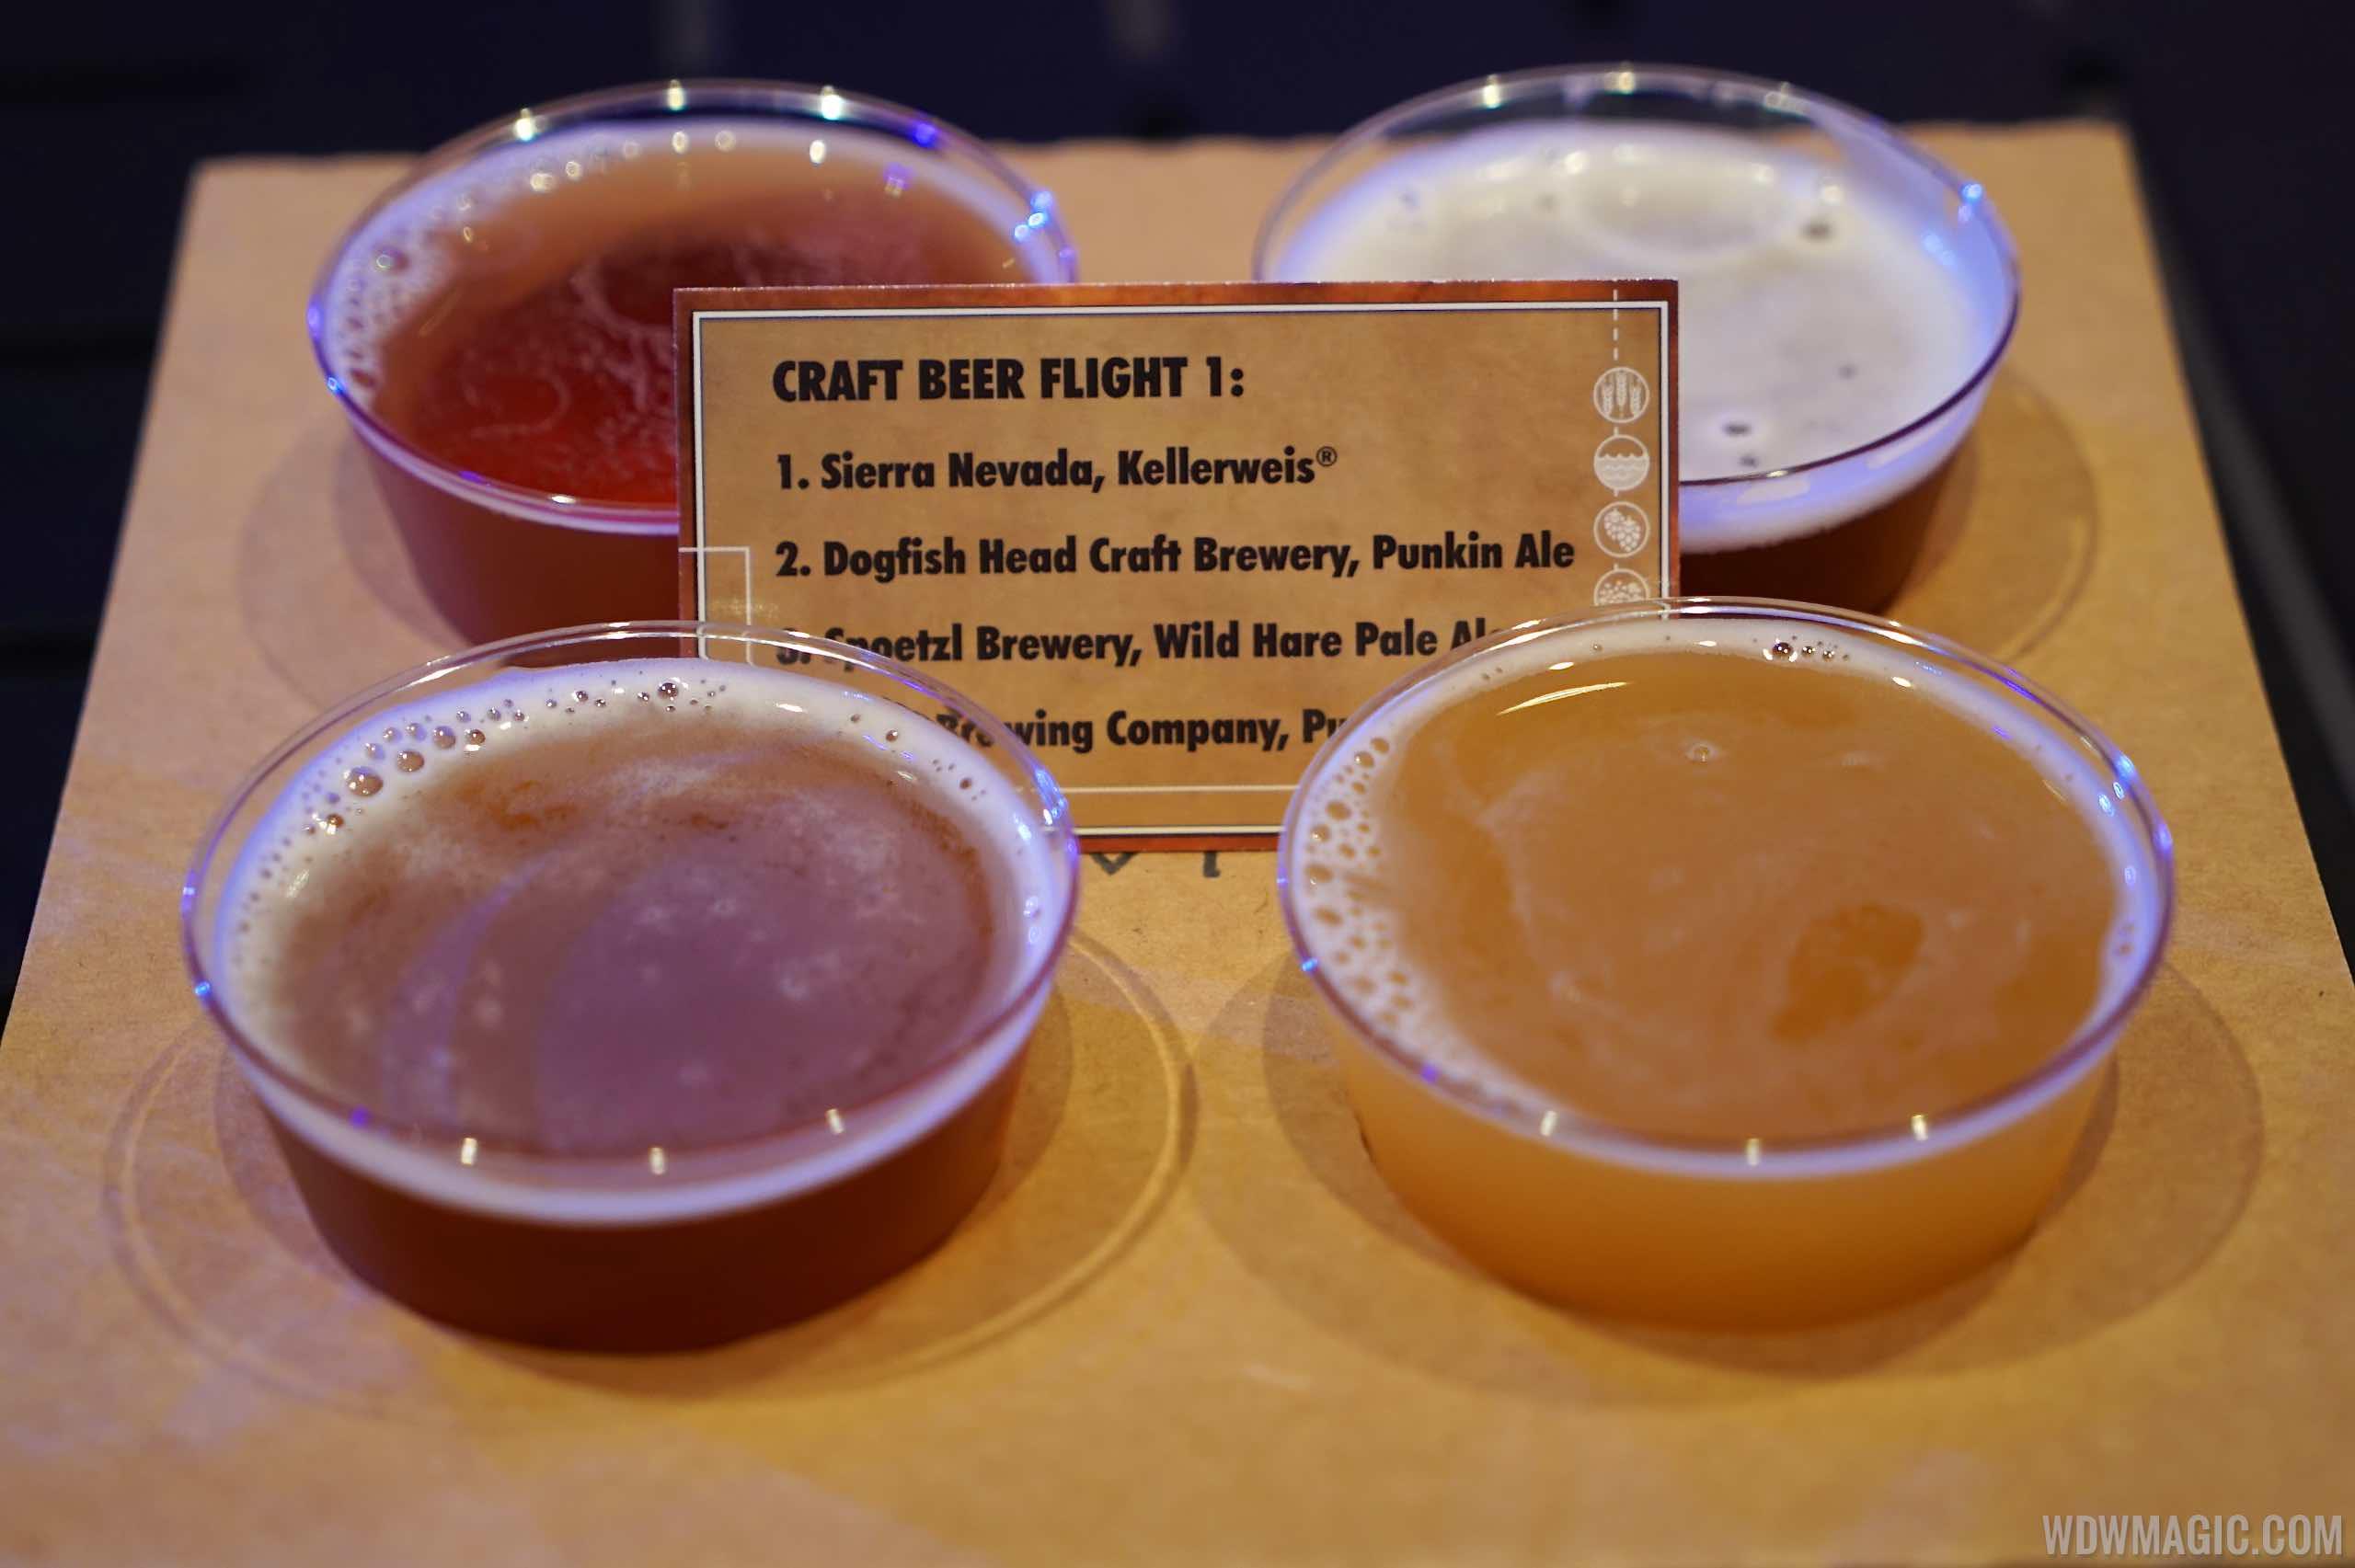 Craft Beer - Flight 1